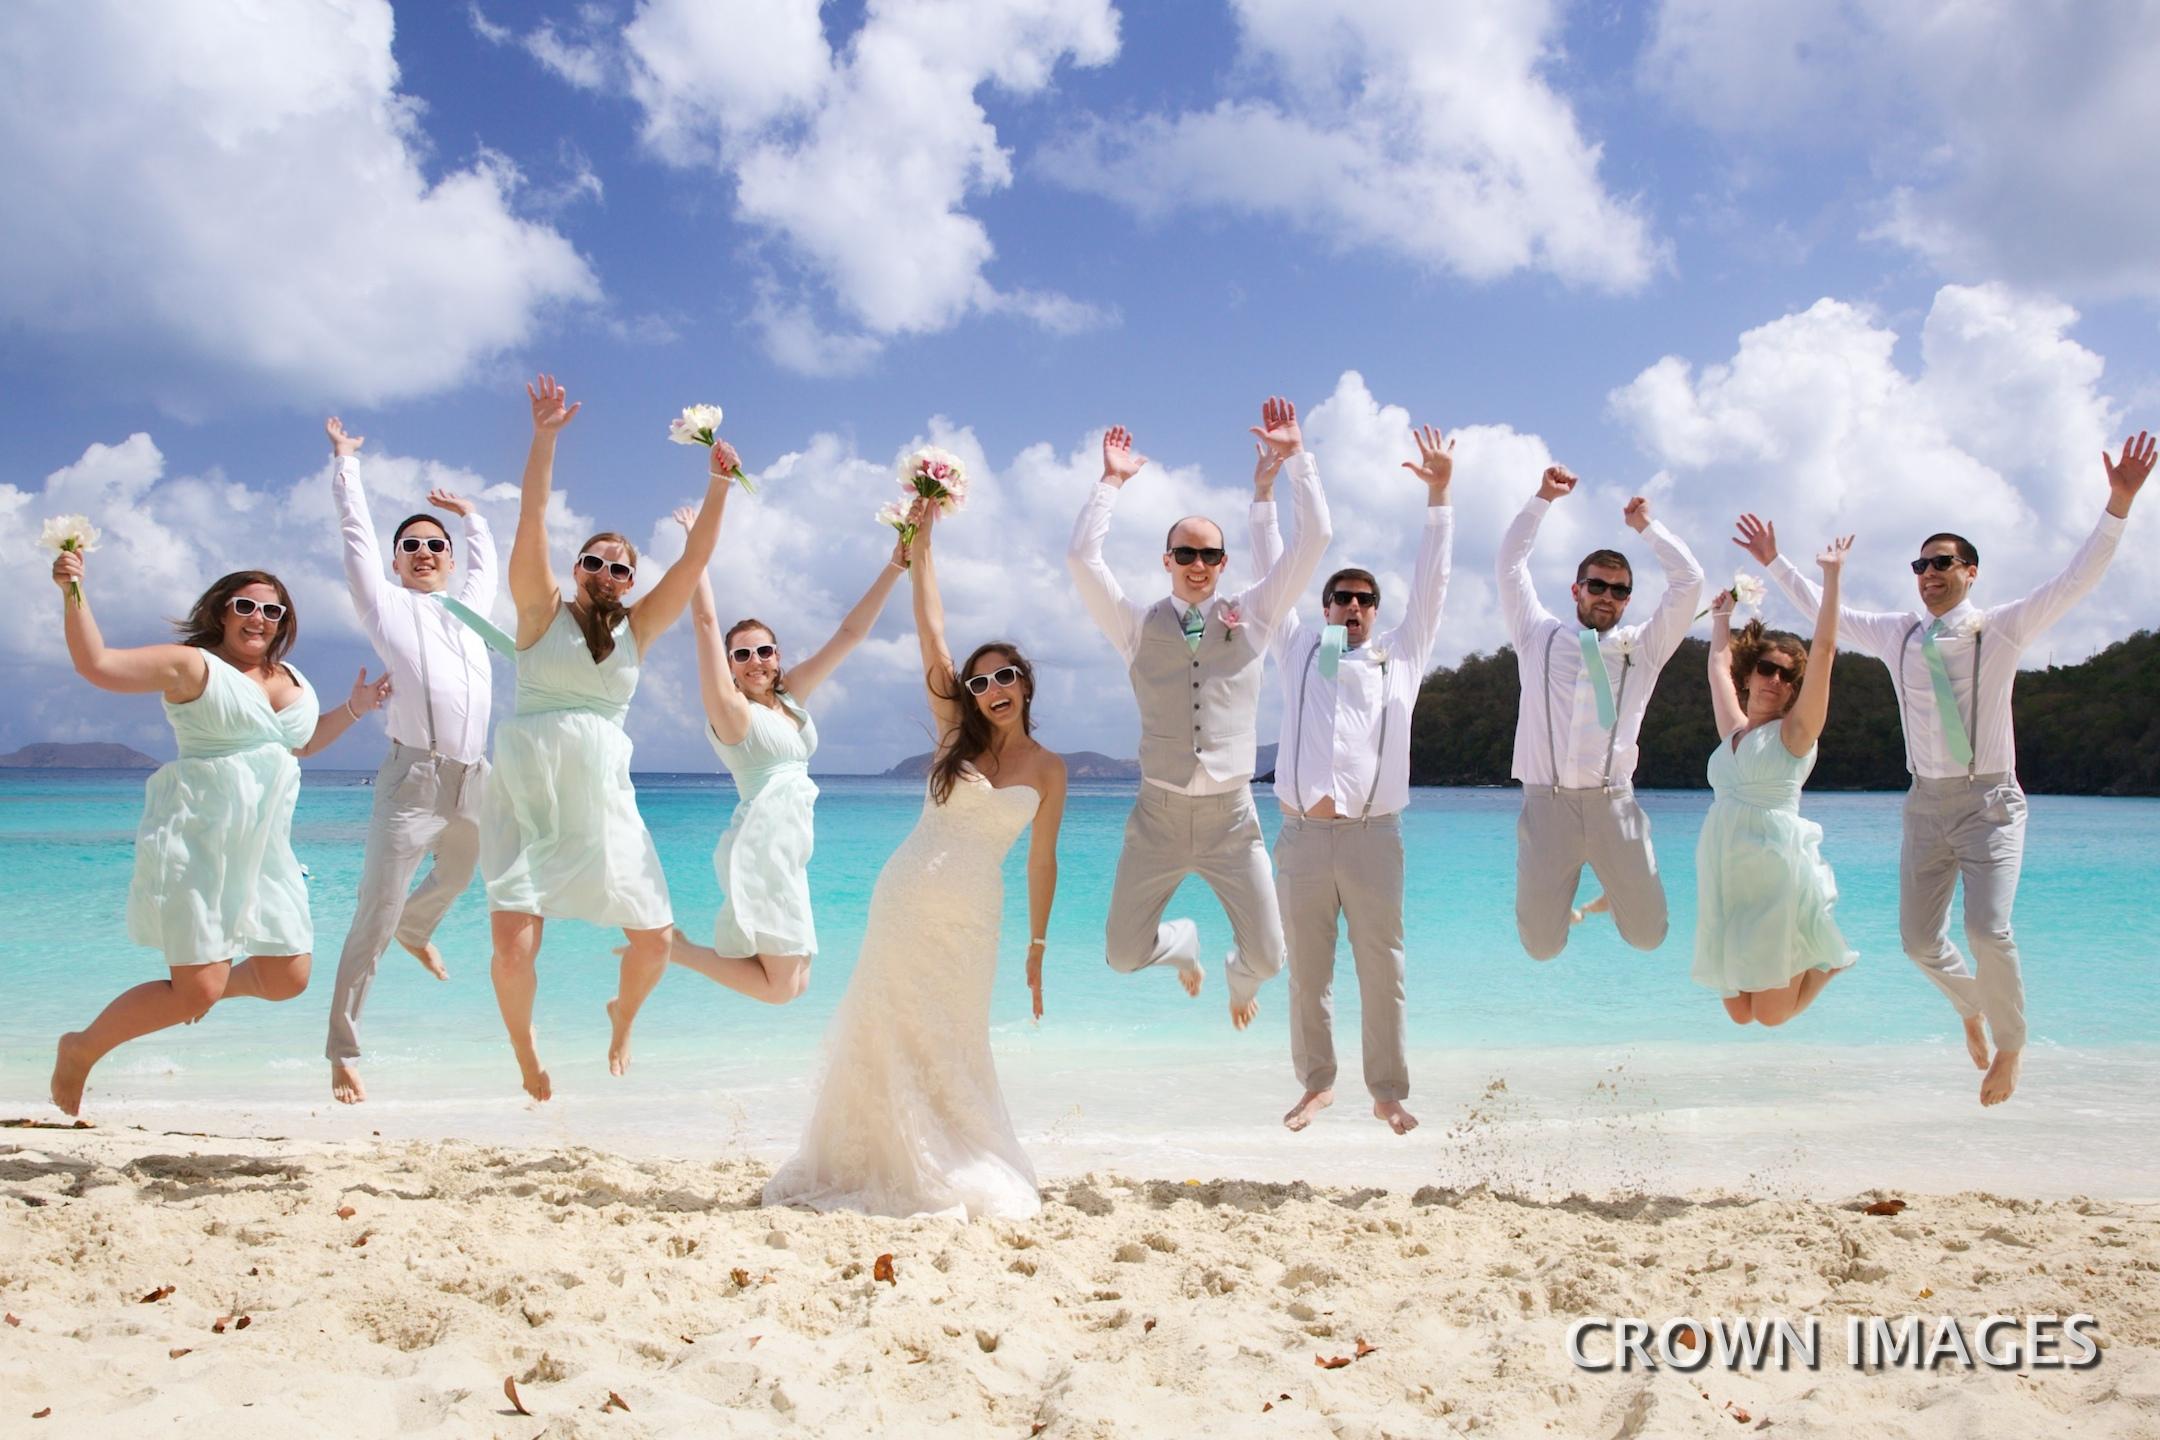 st john wedding locations on the beach